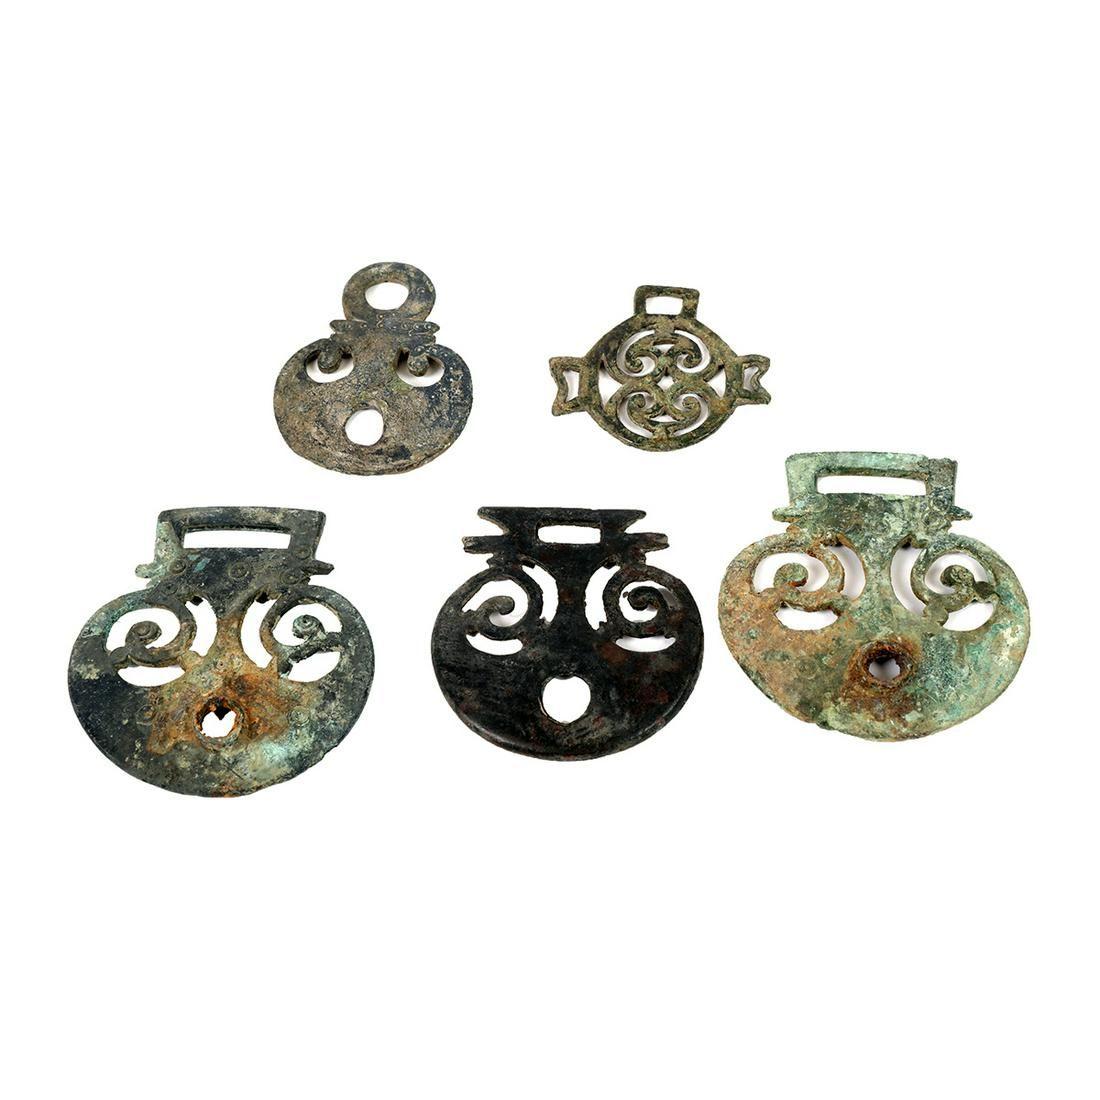 Lot of 5 Ancient Roman Bronze Belt Buckle Ornaments